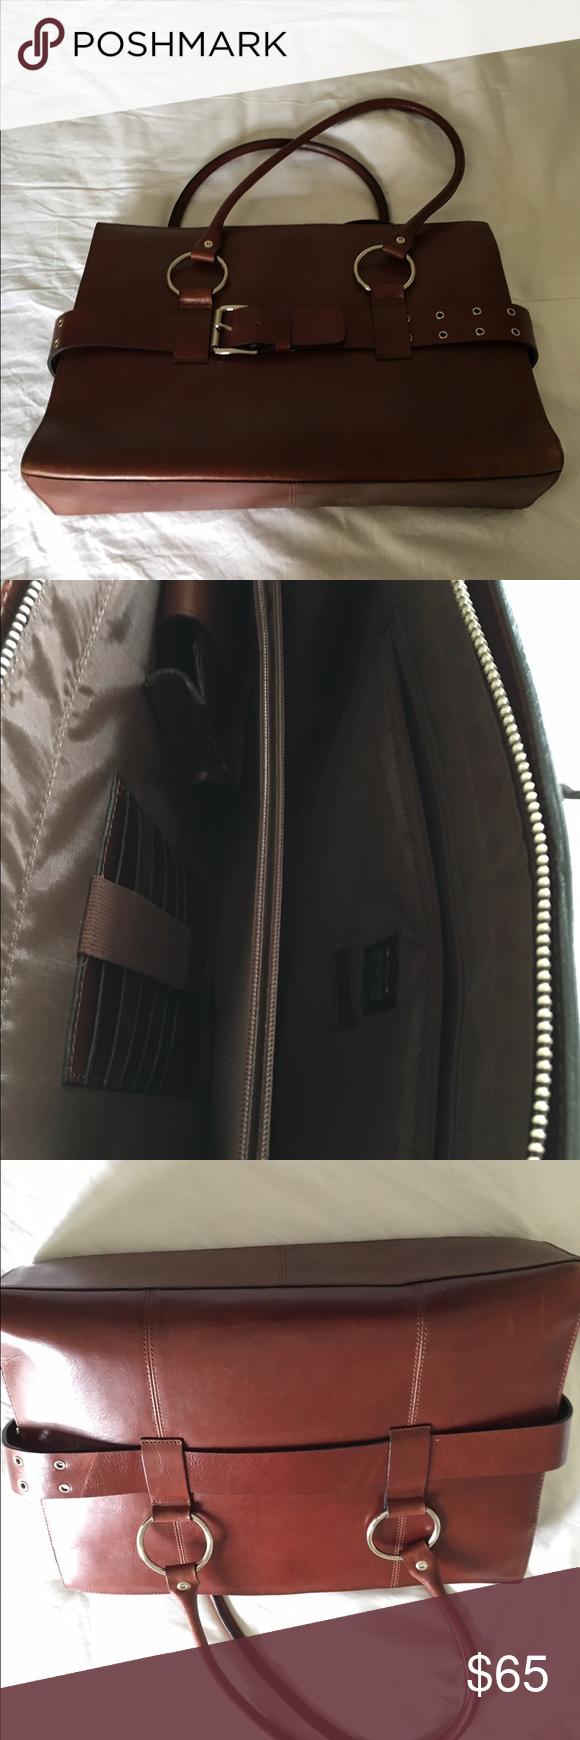 Wilson genuine brown leather bag or briefcase Brown